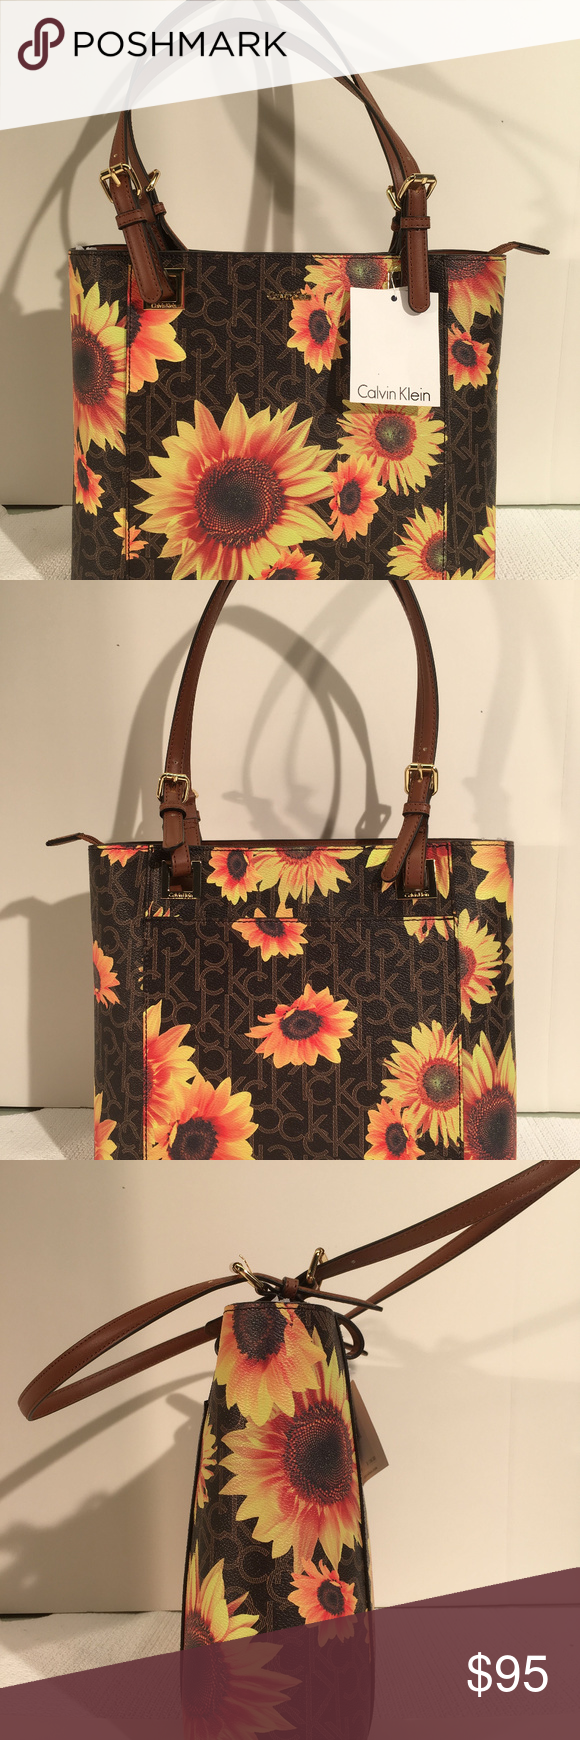 45940fb7558 Calvin Klein Sunflower Tote Shopper NWT AUTHENTIC NEW NWT CALVIN KLEIN  SUNFLOWER YELLOW BROWN TOTE H8ABJ6UW